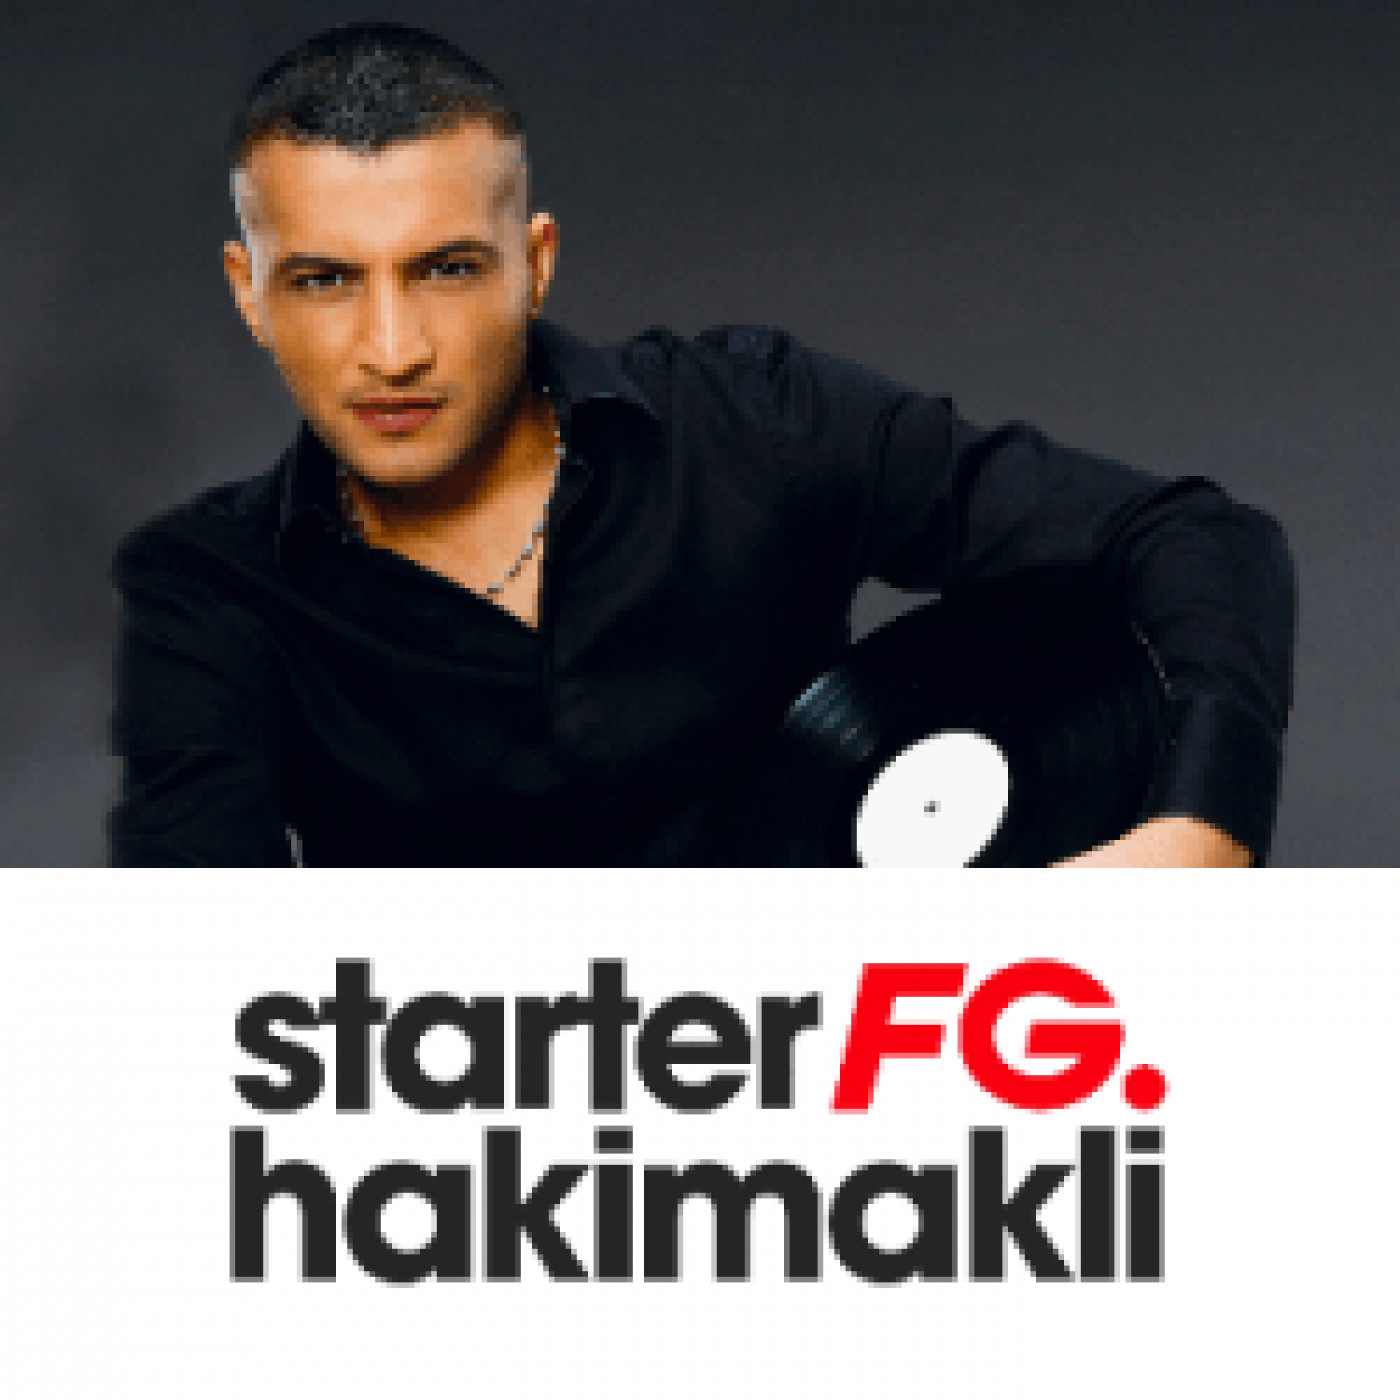 STARTER FG BY HAKIMAKLI MERCREDI 16 DECEMBRE 2020